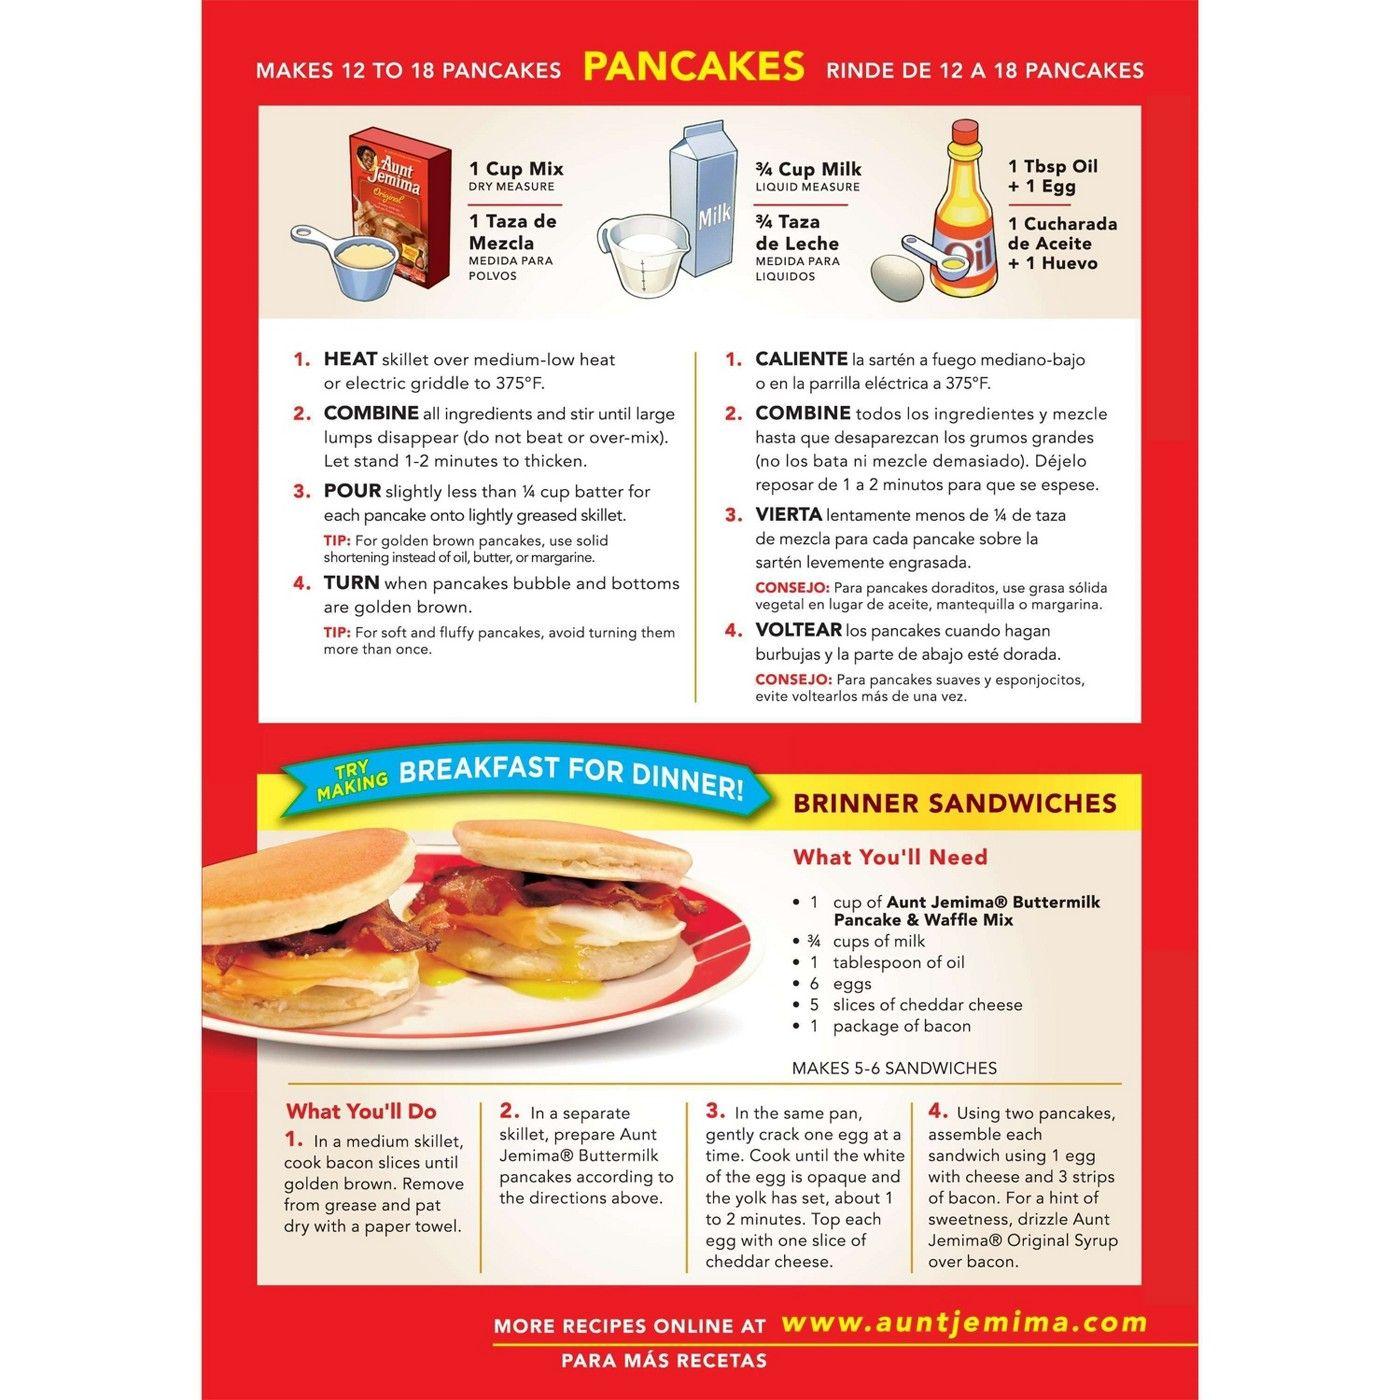 Aunt Jemima Buttermilk Pancake Mix 32 Oz Buttermilk Pancake Mix Aunt Jemima Pancake Mix Aunt Jemima Pancake Mix Recipe